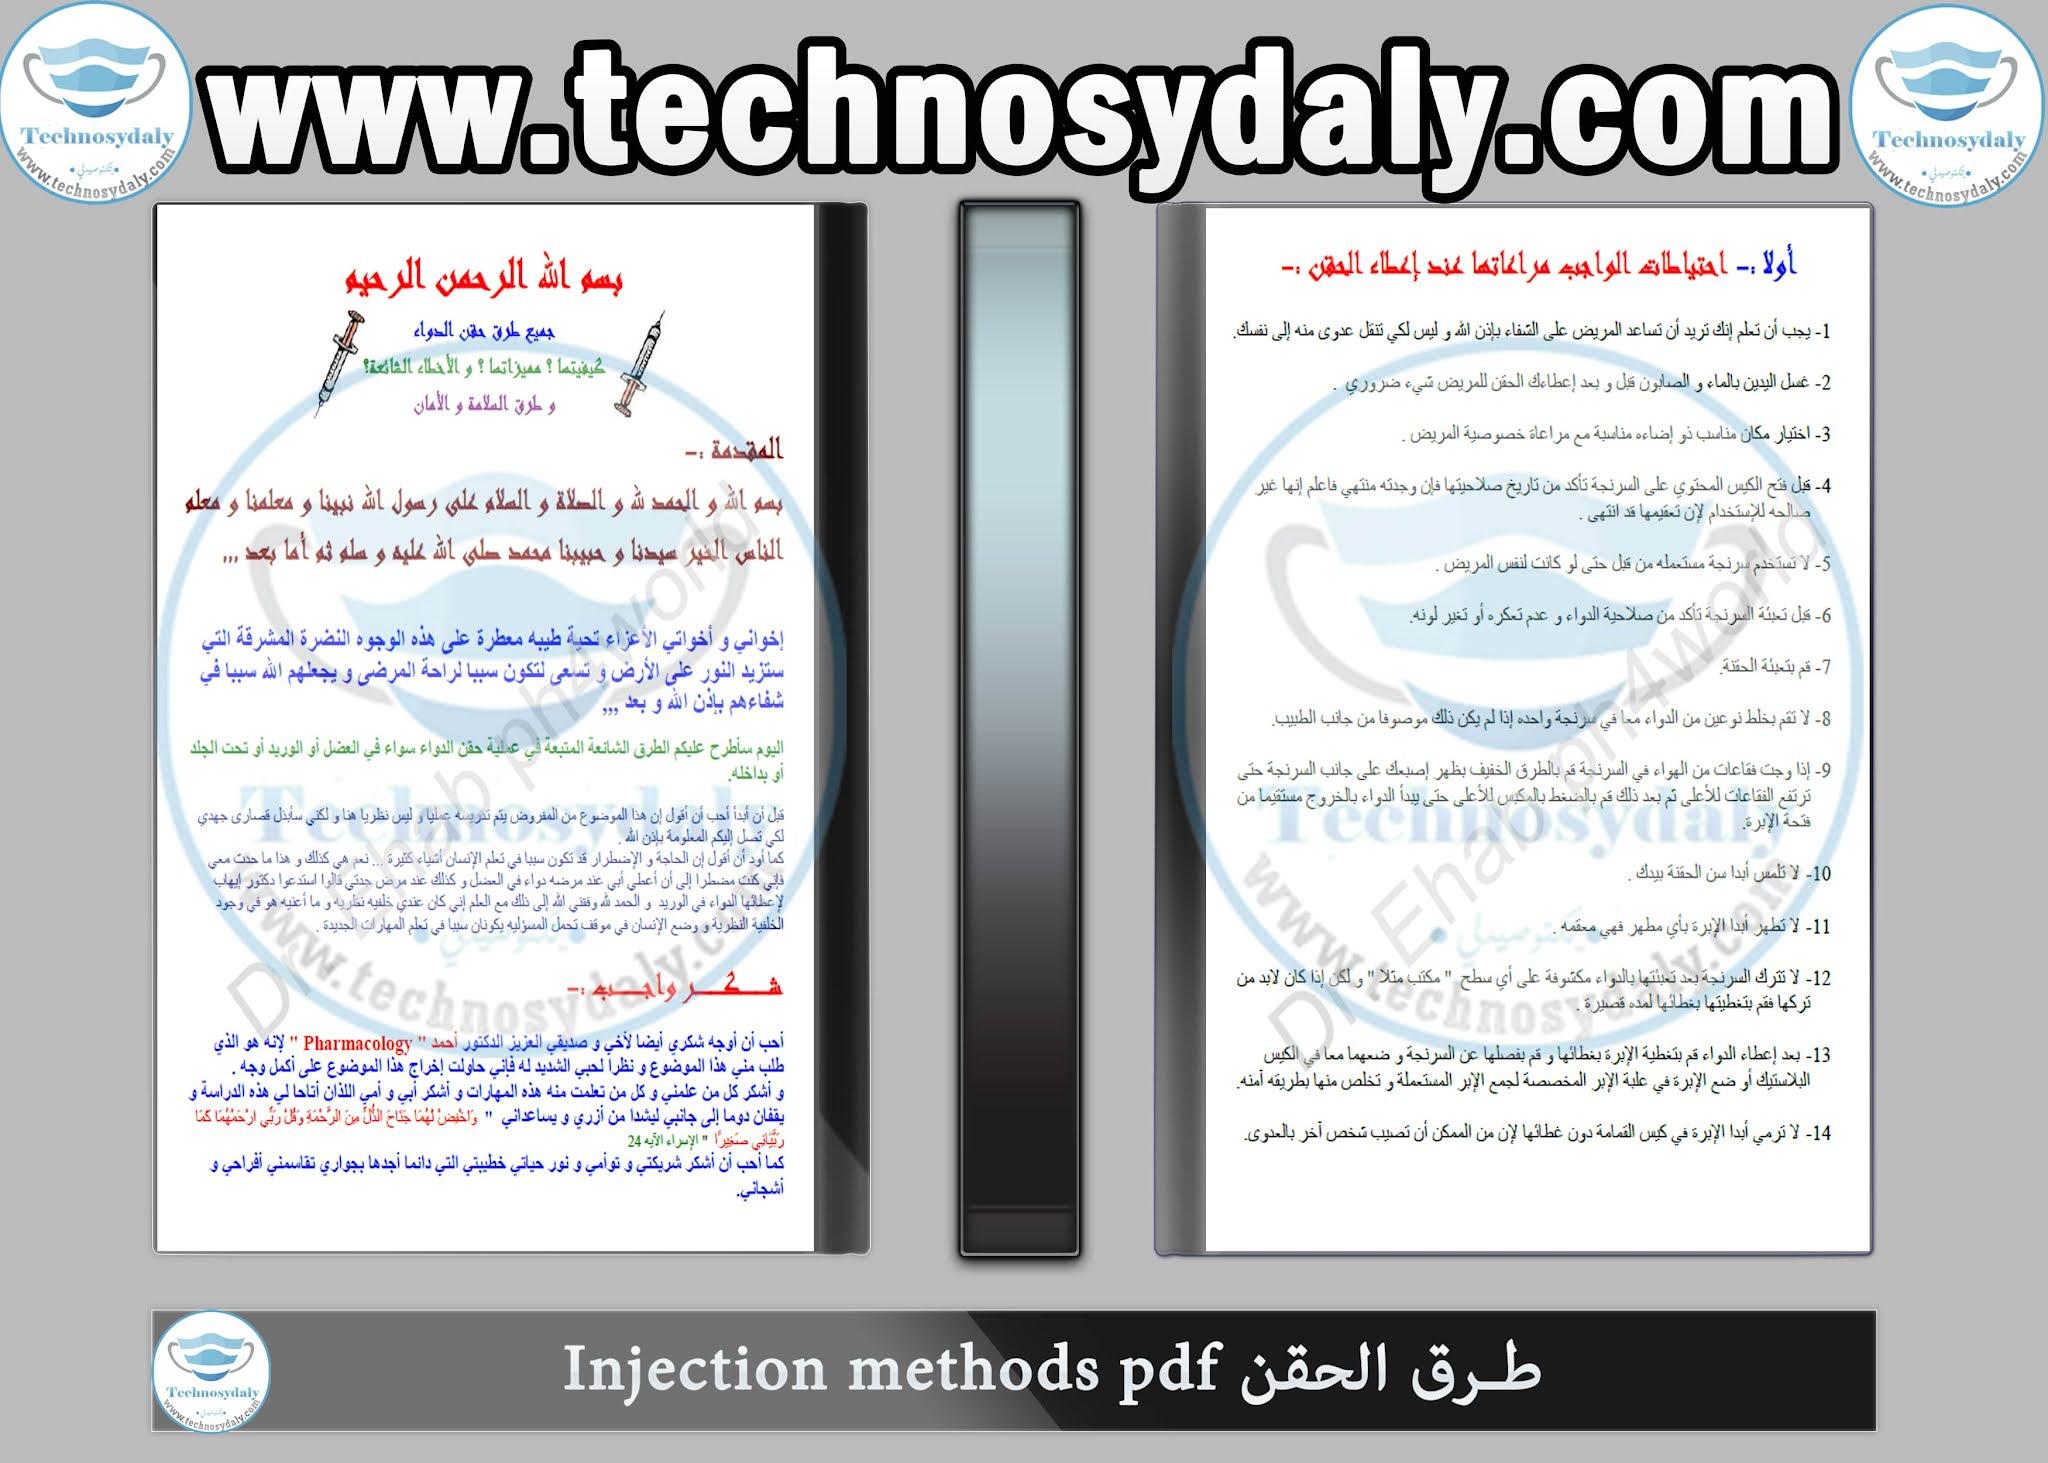 كتاب طرق الحقن Injection methods pdf